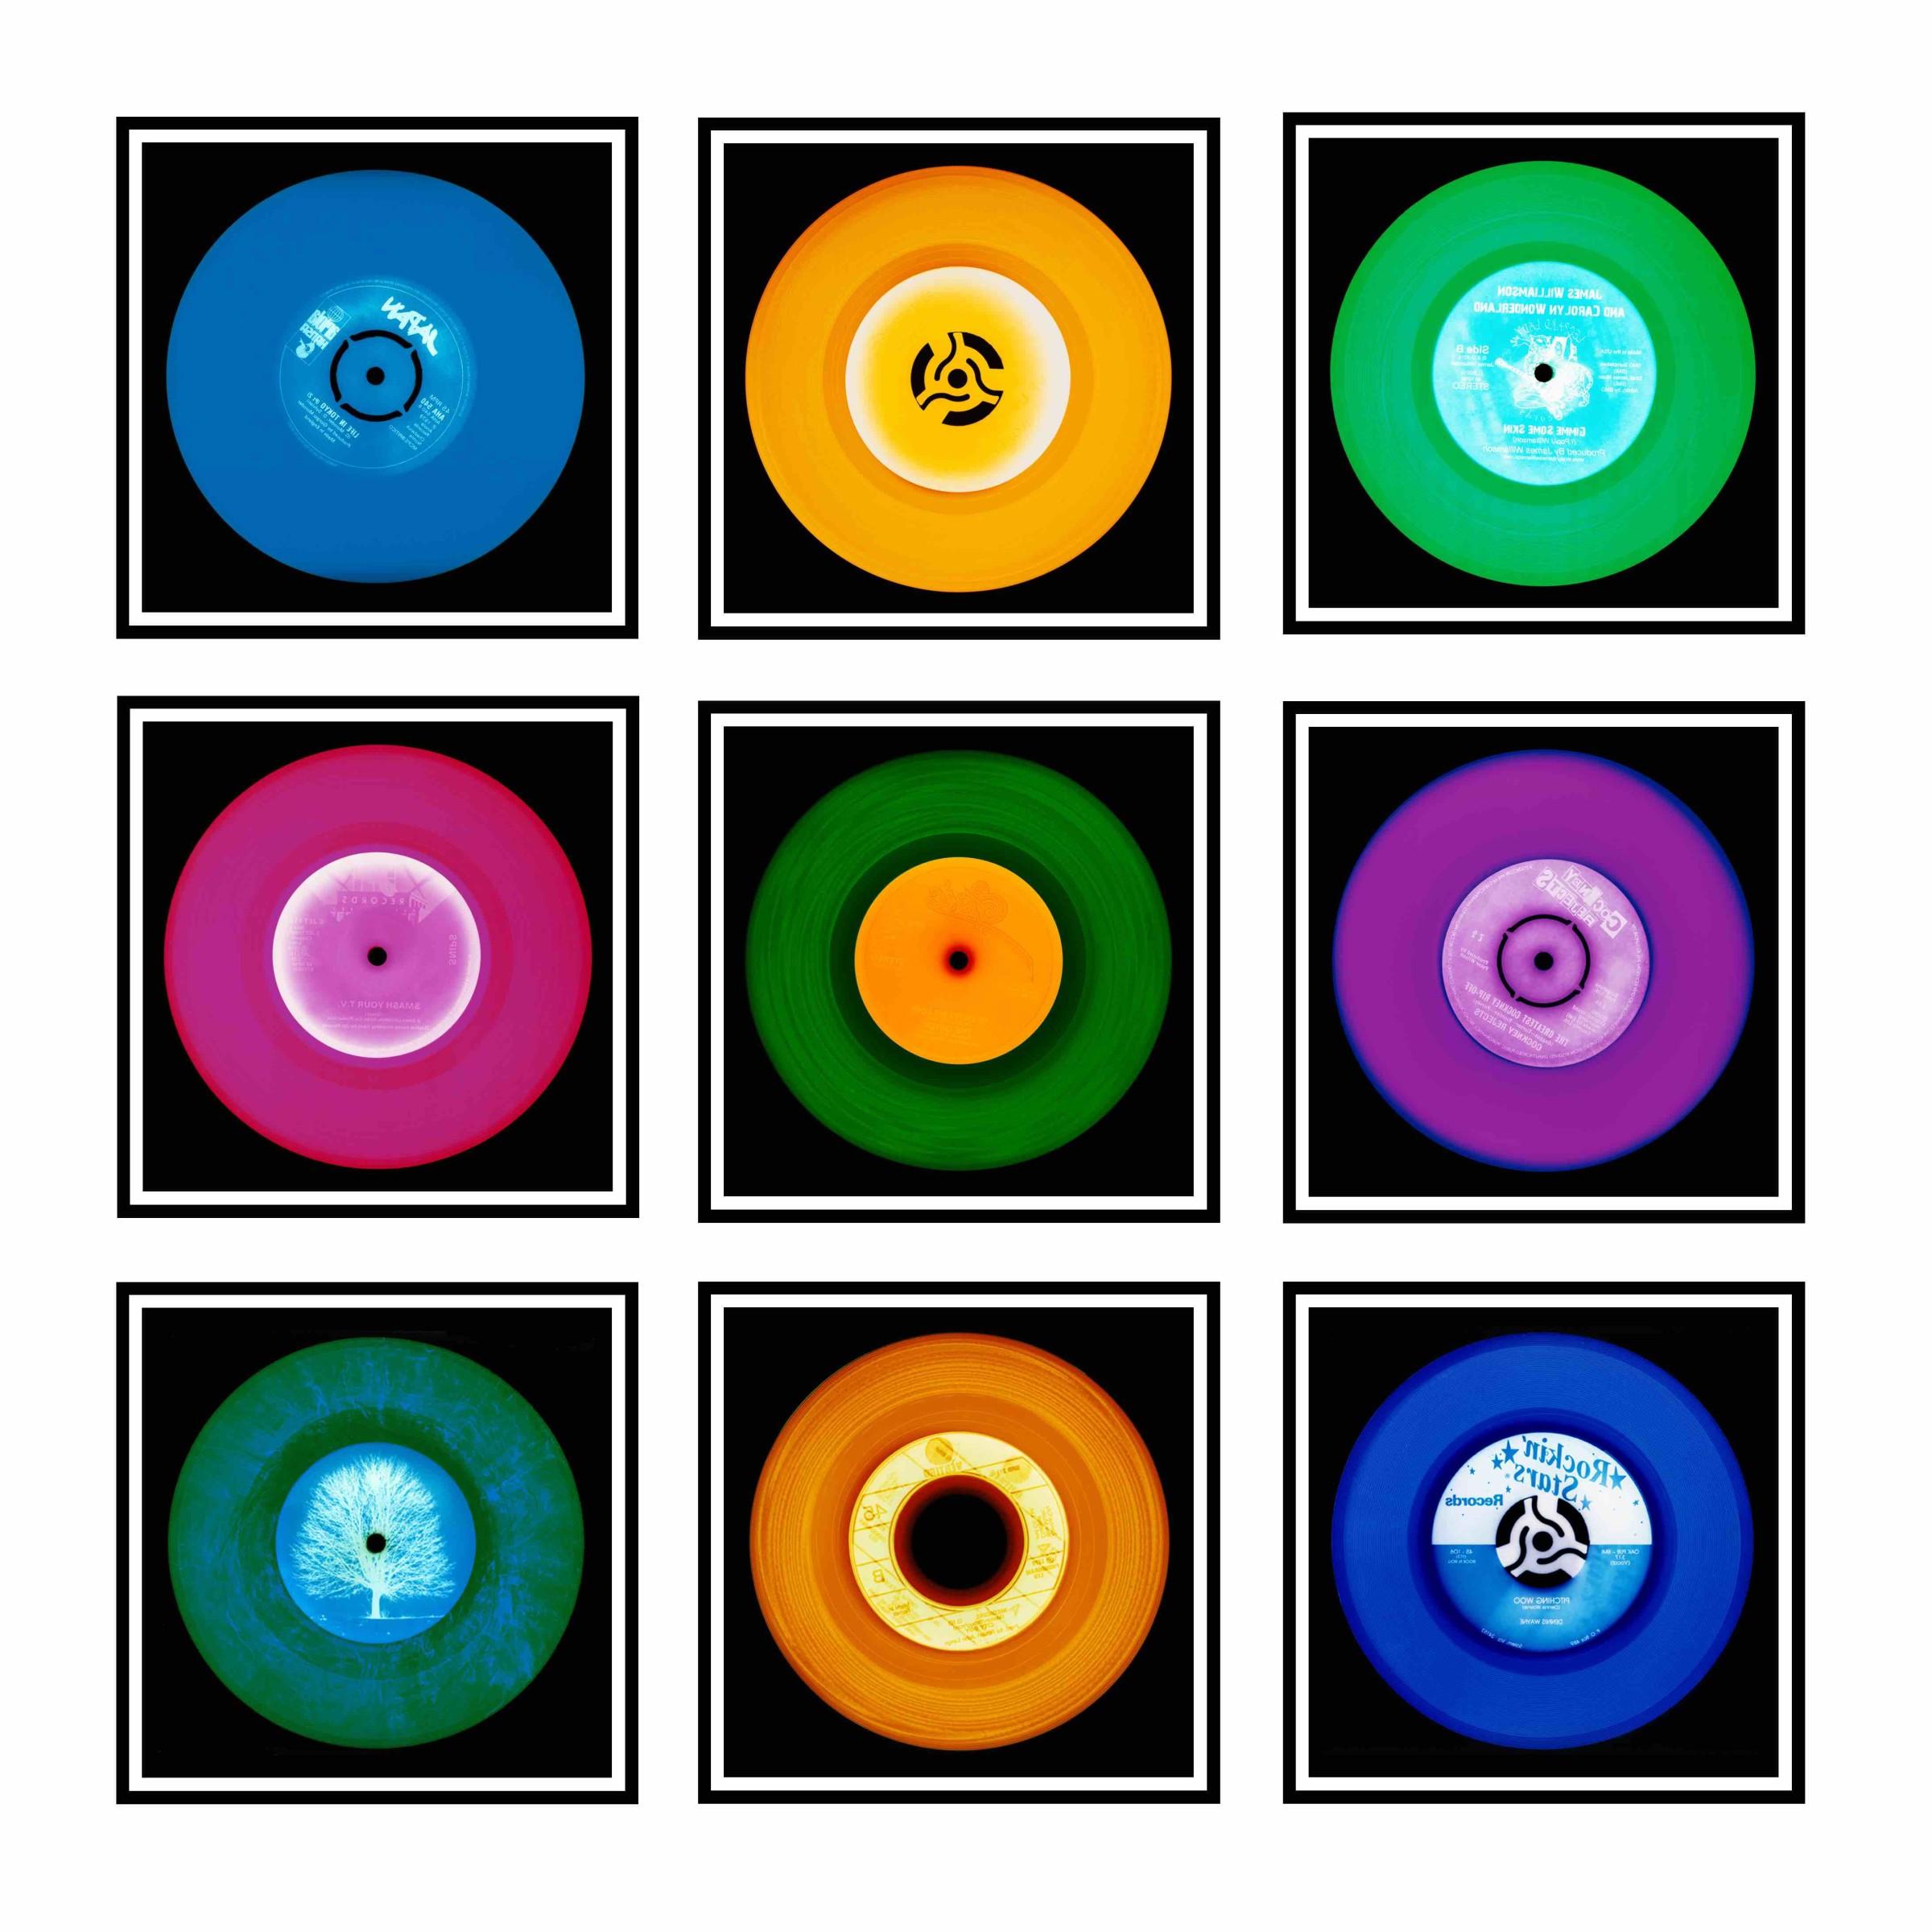 "<span class=""link fancybox-details-link""><a href=""/artists/183-heidler-%26-heeps/works/2873-heidler-heeps-vinyl-installation/"">View Detail Page</a></span><div class=""artist""><strong>Heidler & Heeps</strong></div> <div class=""title""><em>Vinyl Installation </em></div> <div class=""medium"">C-Type Print (Set of 9)</div> <div class=""dimensions"">32.5 x 32.5 cm (each)</div><div class=""price"">£1,000.00</div><div class=""copyright_line"">Copyright The Artist</div>"